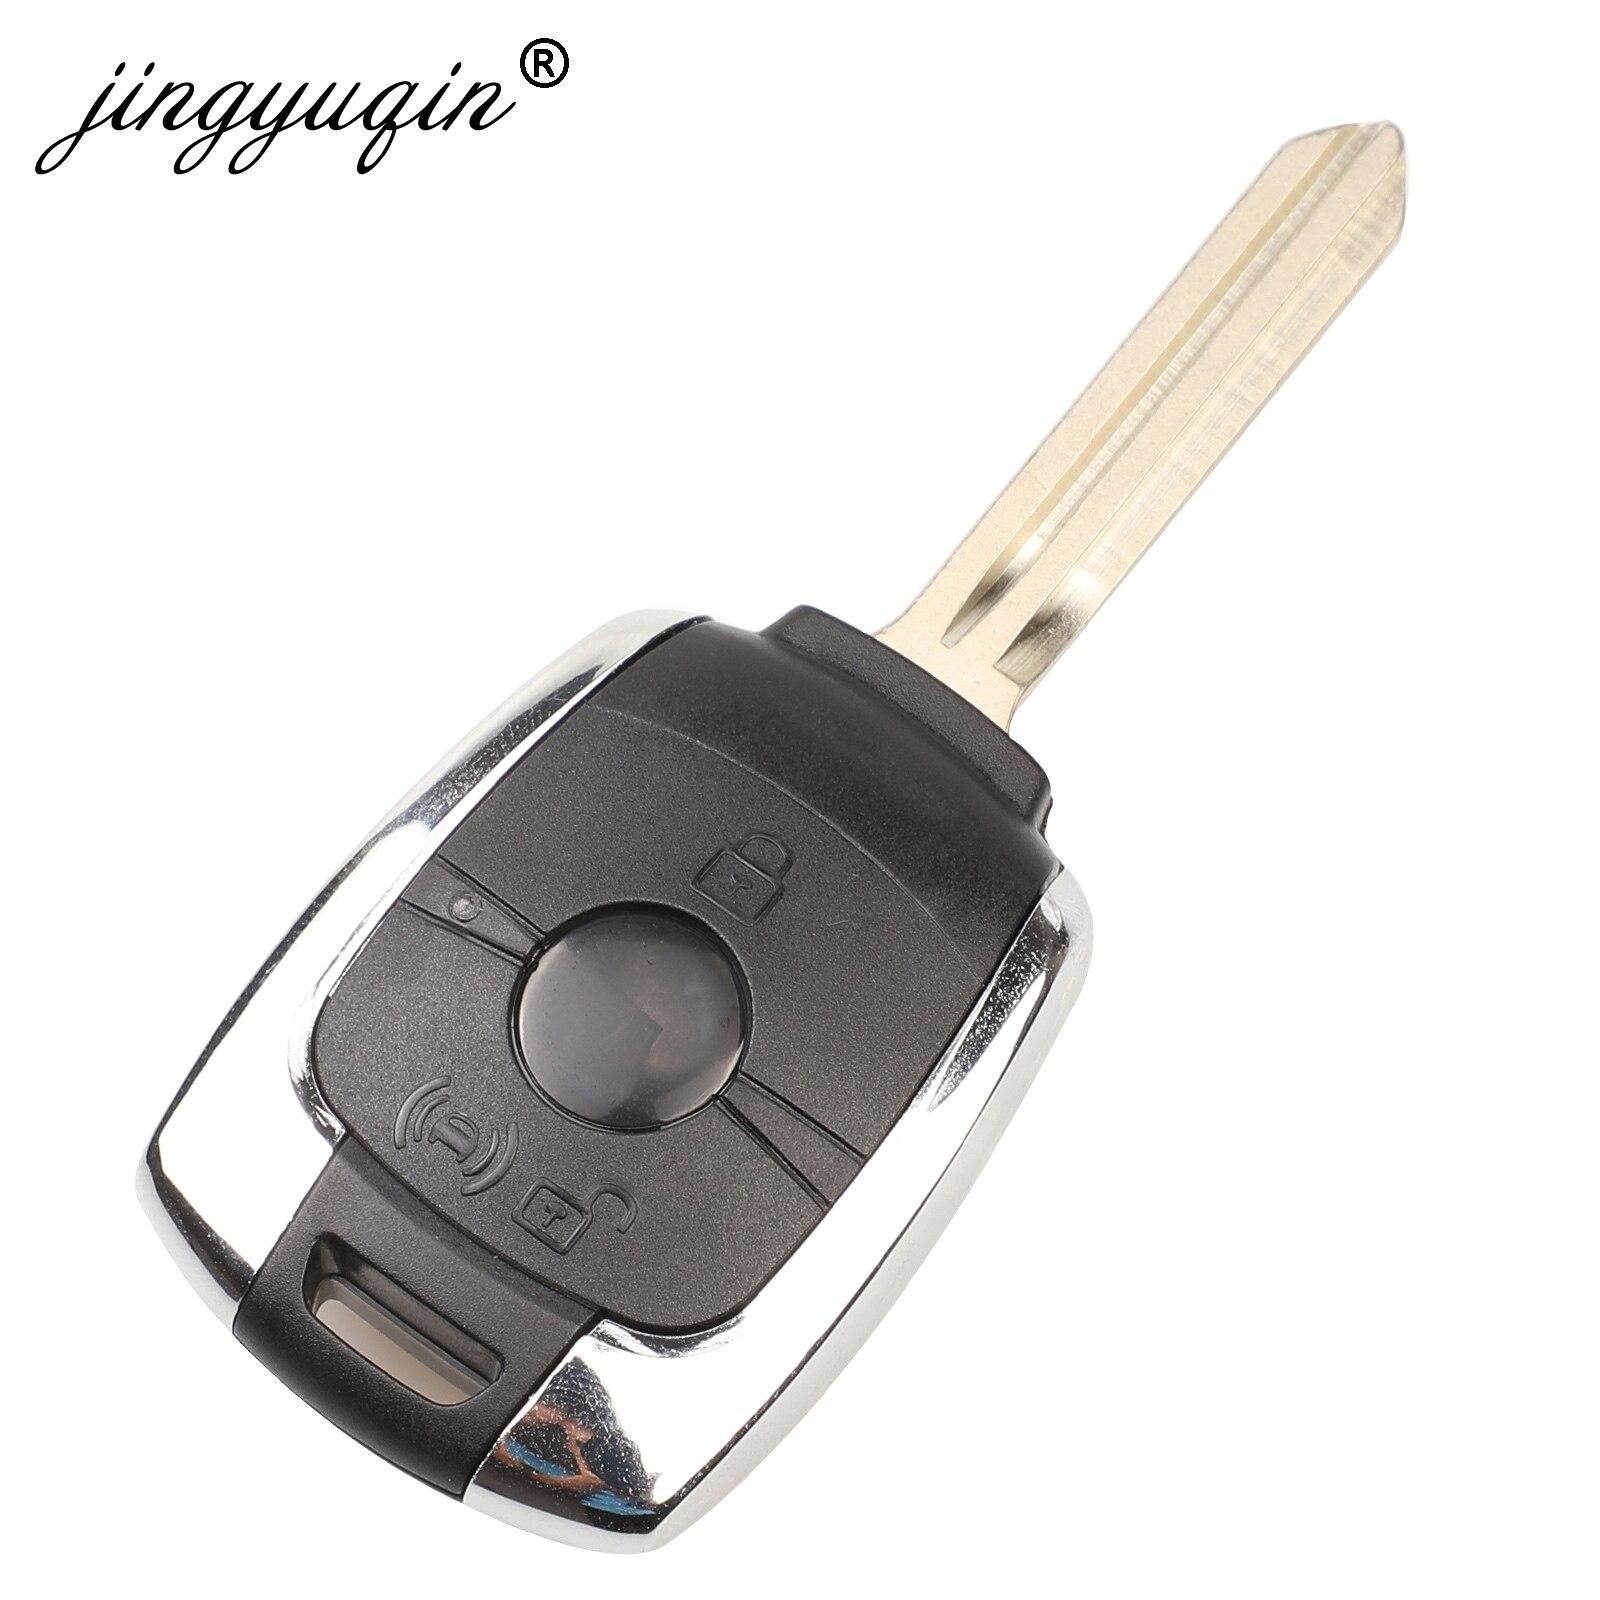 jingyuqin 2 Buttons Remote Key Shell Case Fob For Ssangyong Actyon Kyron Rexton Korando Uncut Blade car keys Cover Replacement